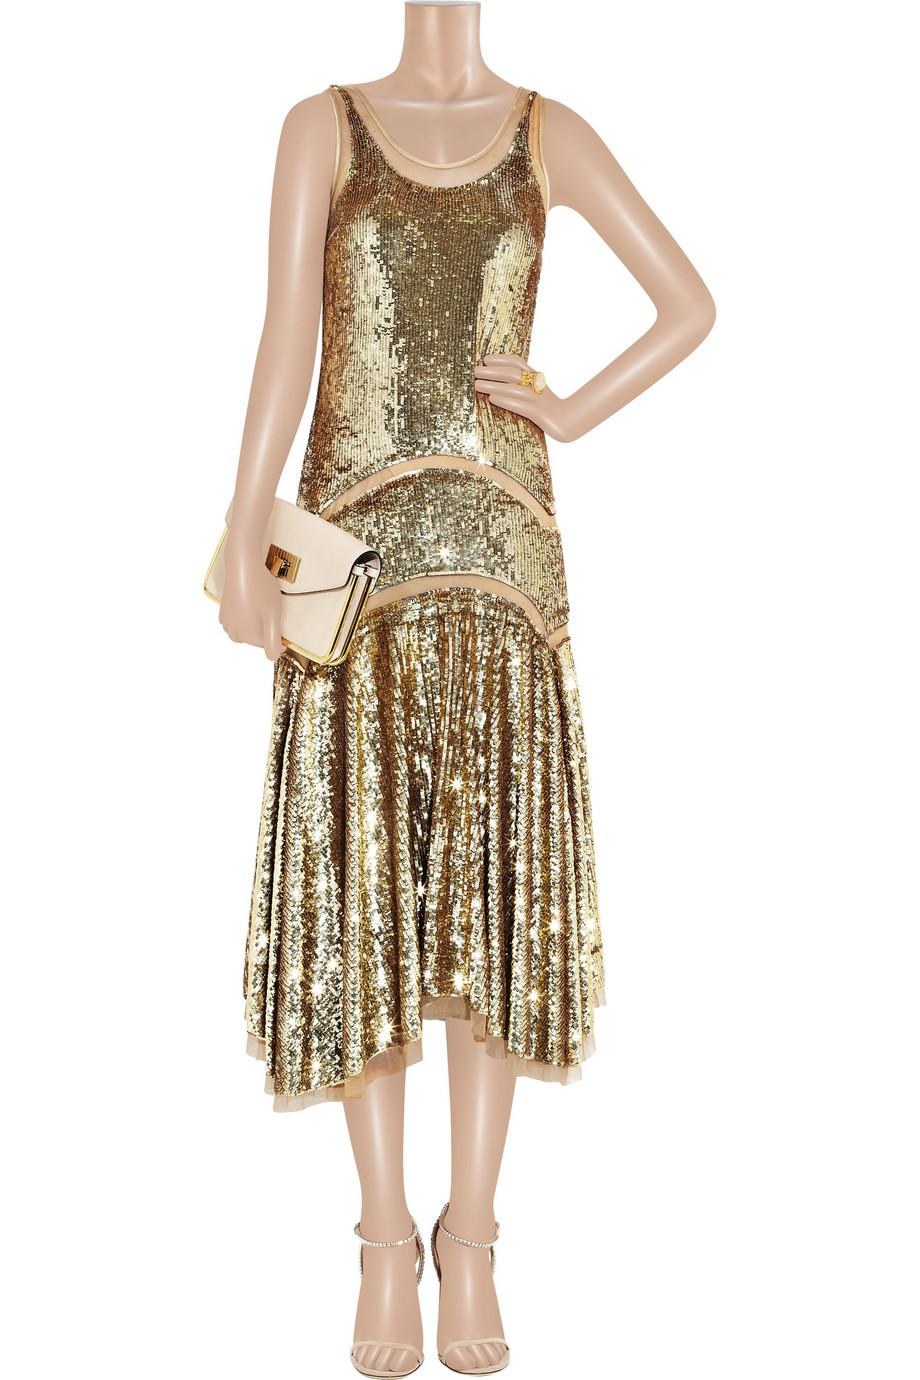 Michael Kors Sequined Midi Dress In Metallic Lyst